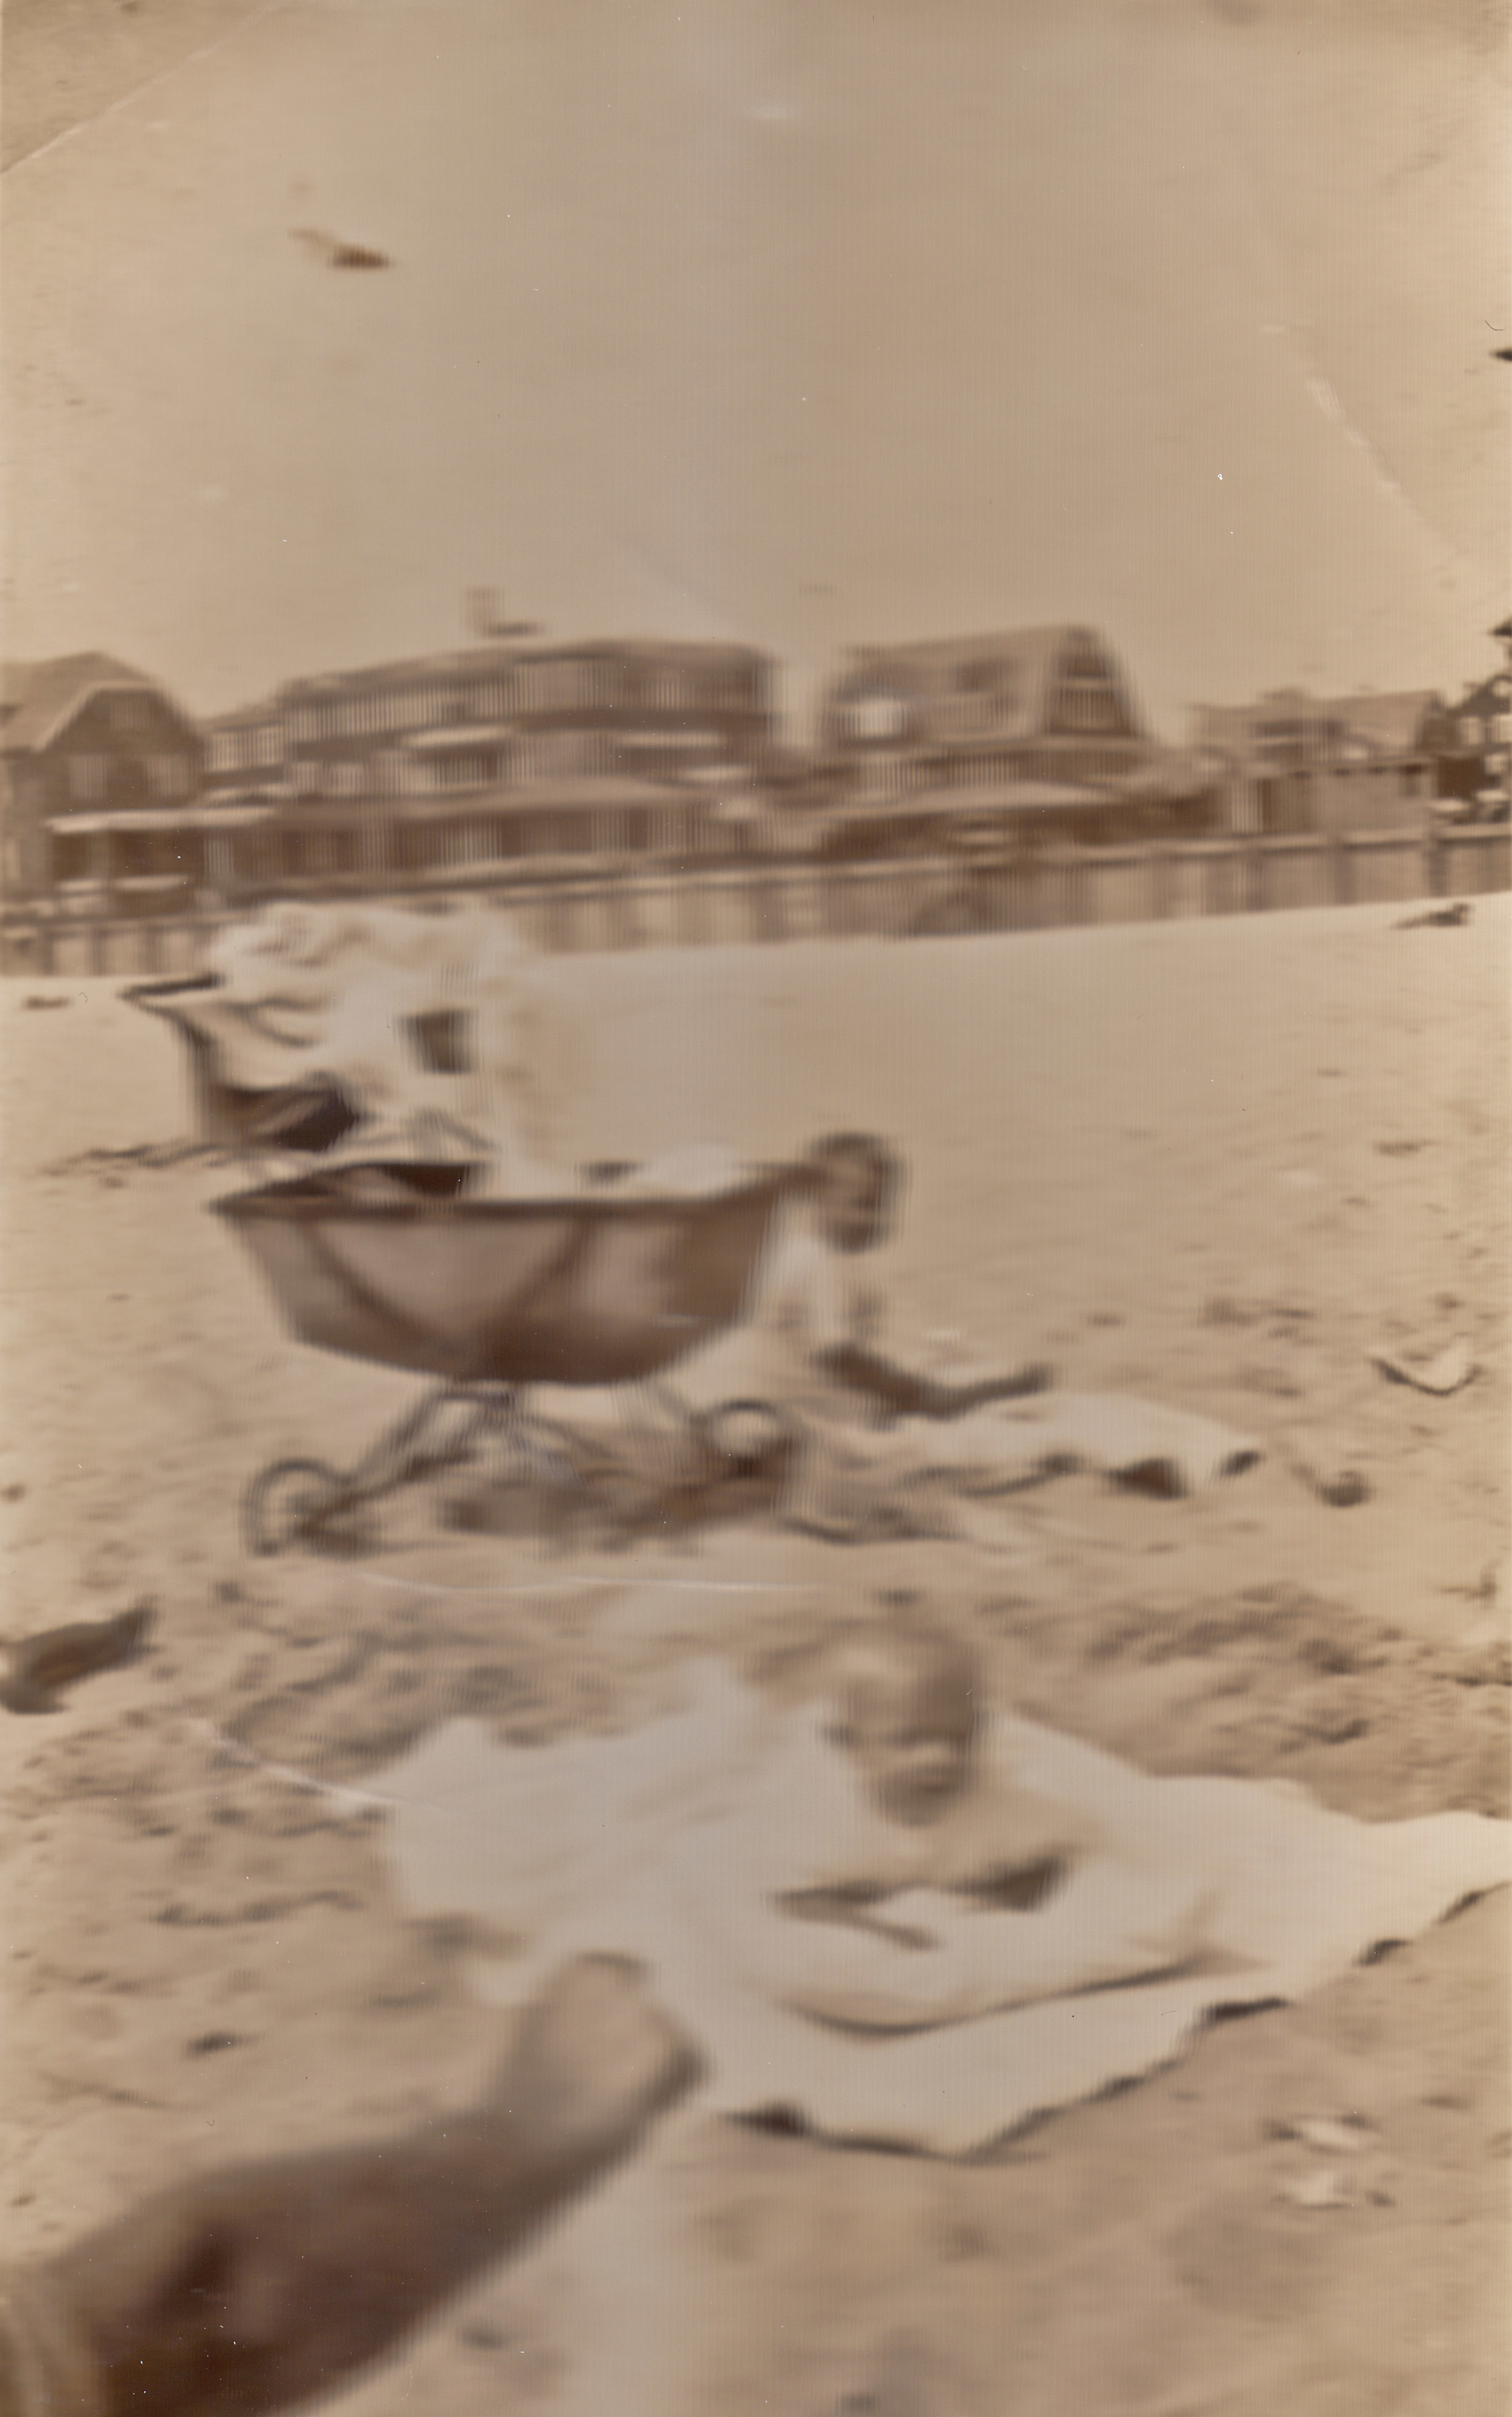 Morty - 1928